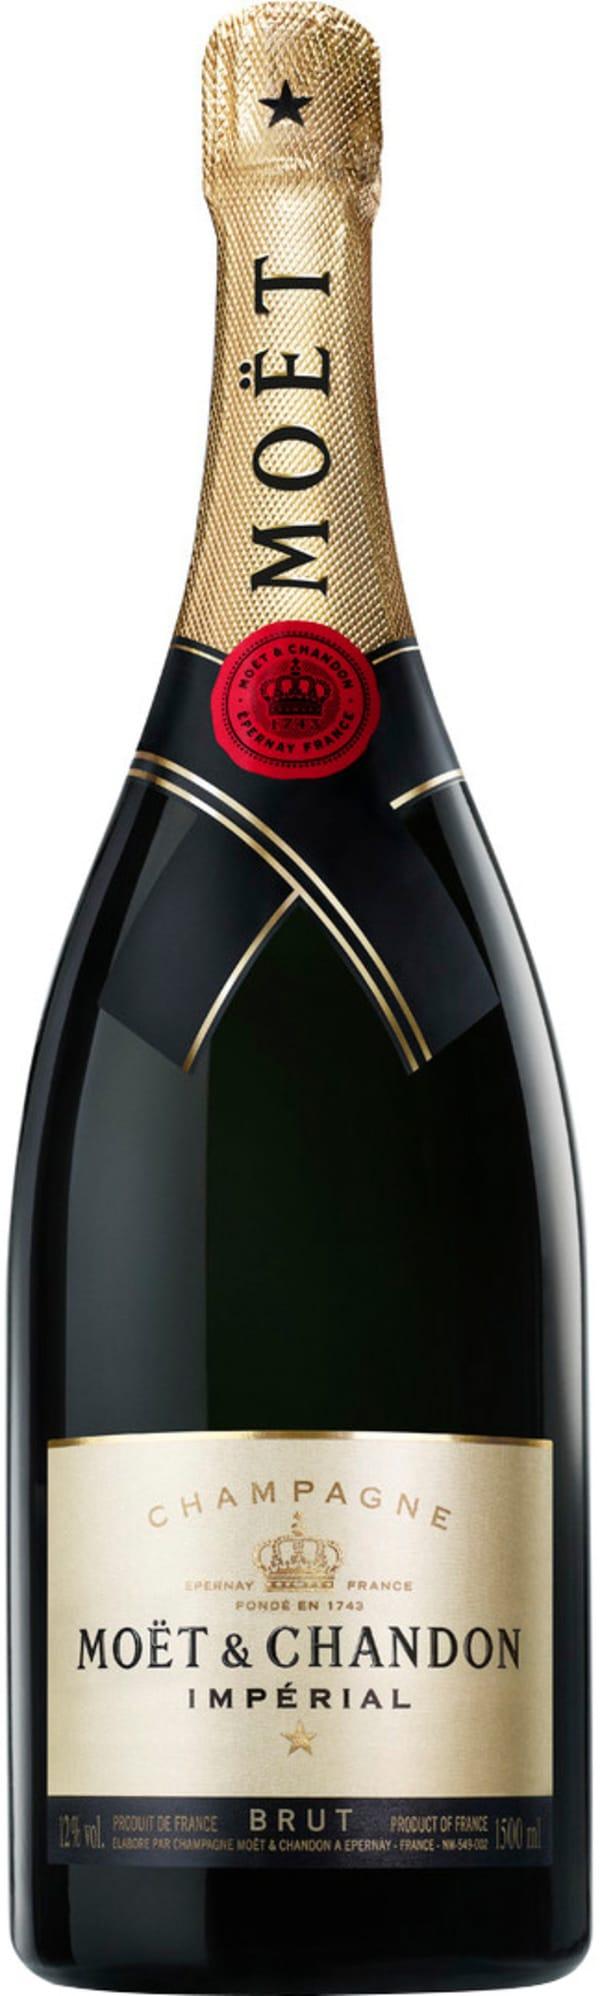 Moët & Chandon Impérial Magnum Champagne Brut